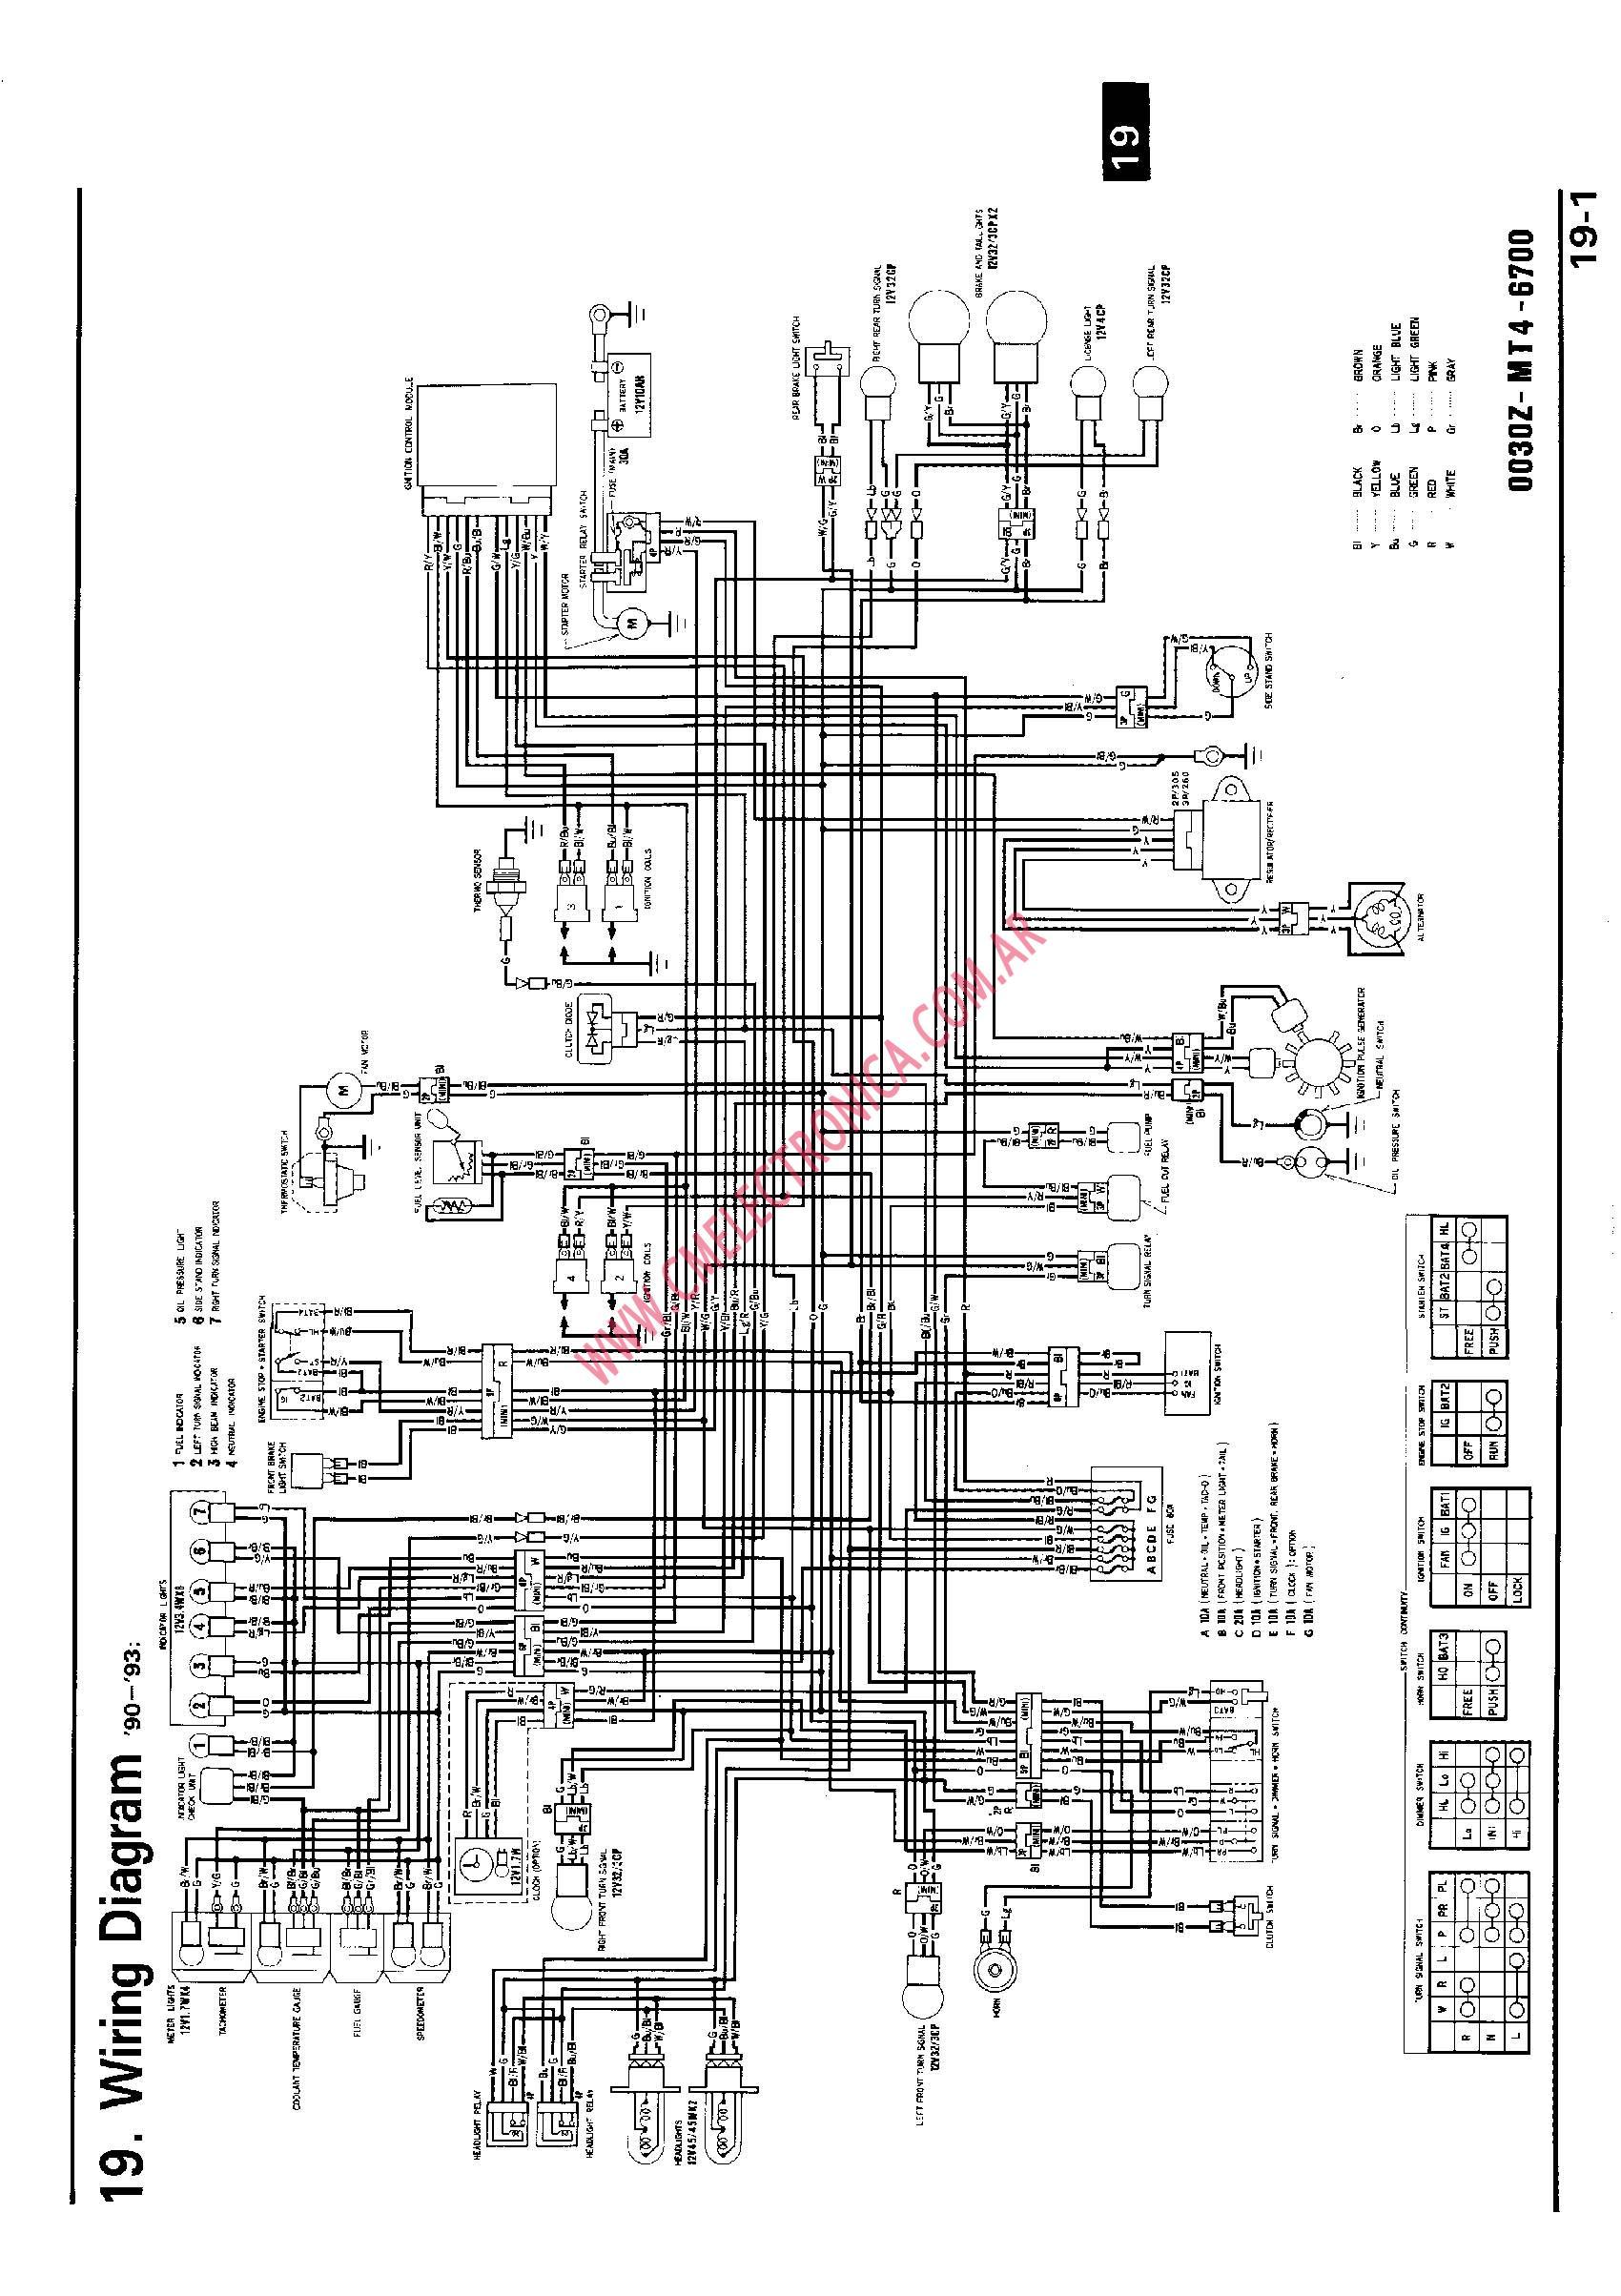 1983 xt yamaha 250 wiring diagram  diagram  auto wiring